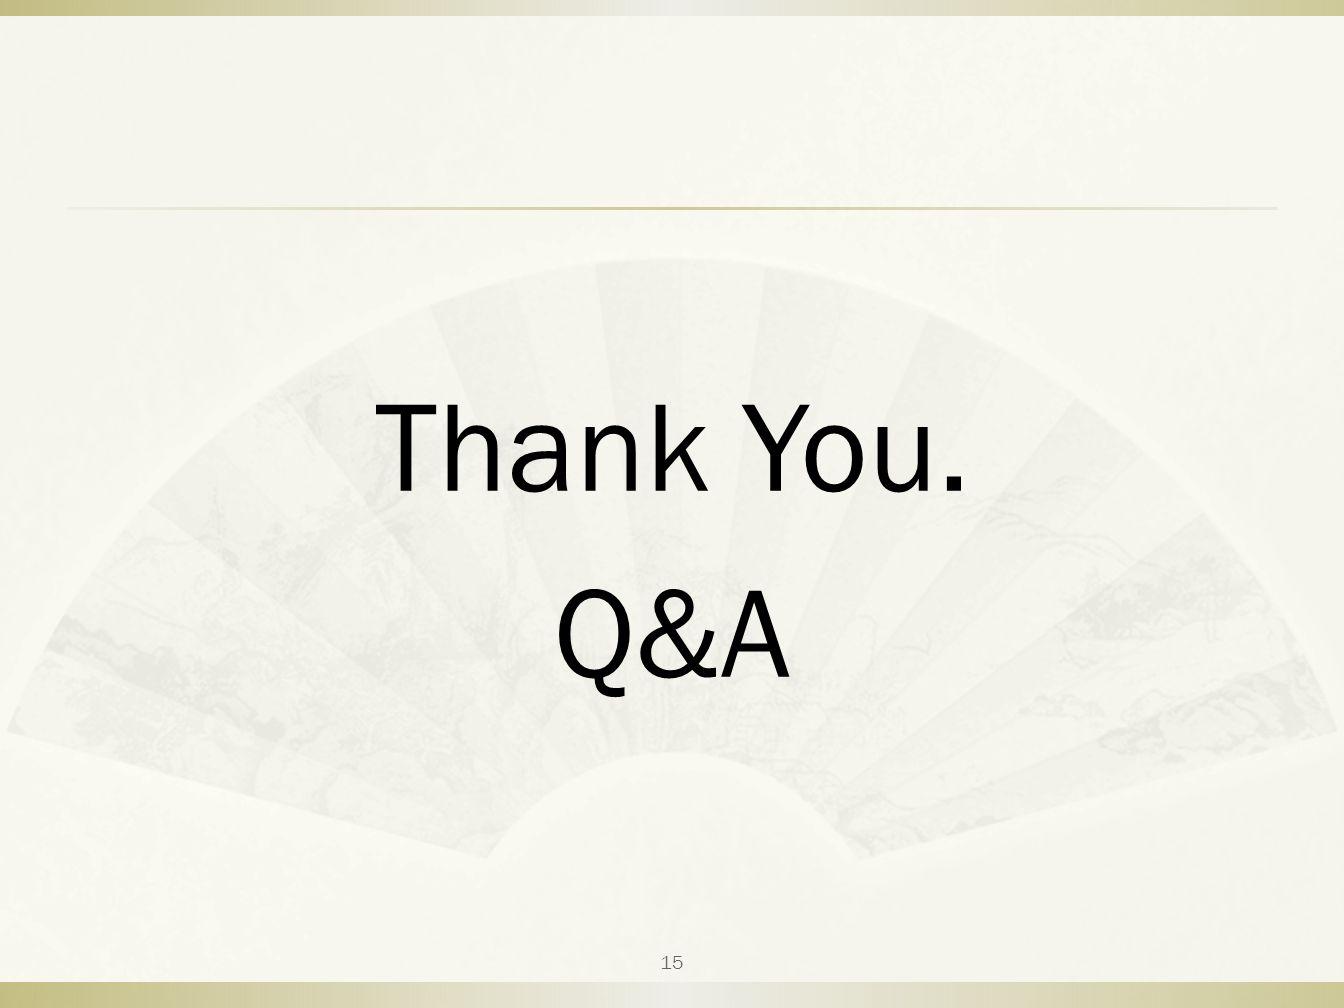 Thank You. Q&A 15